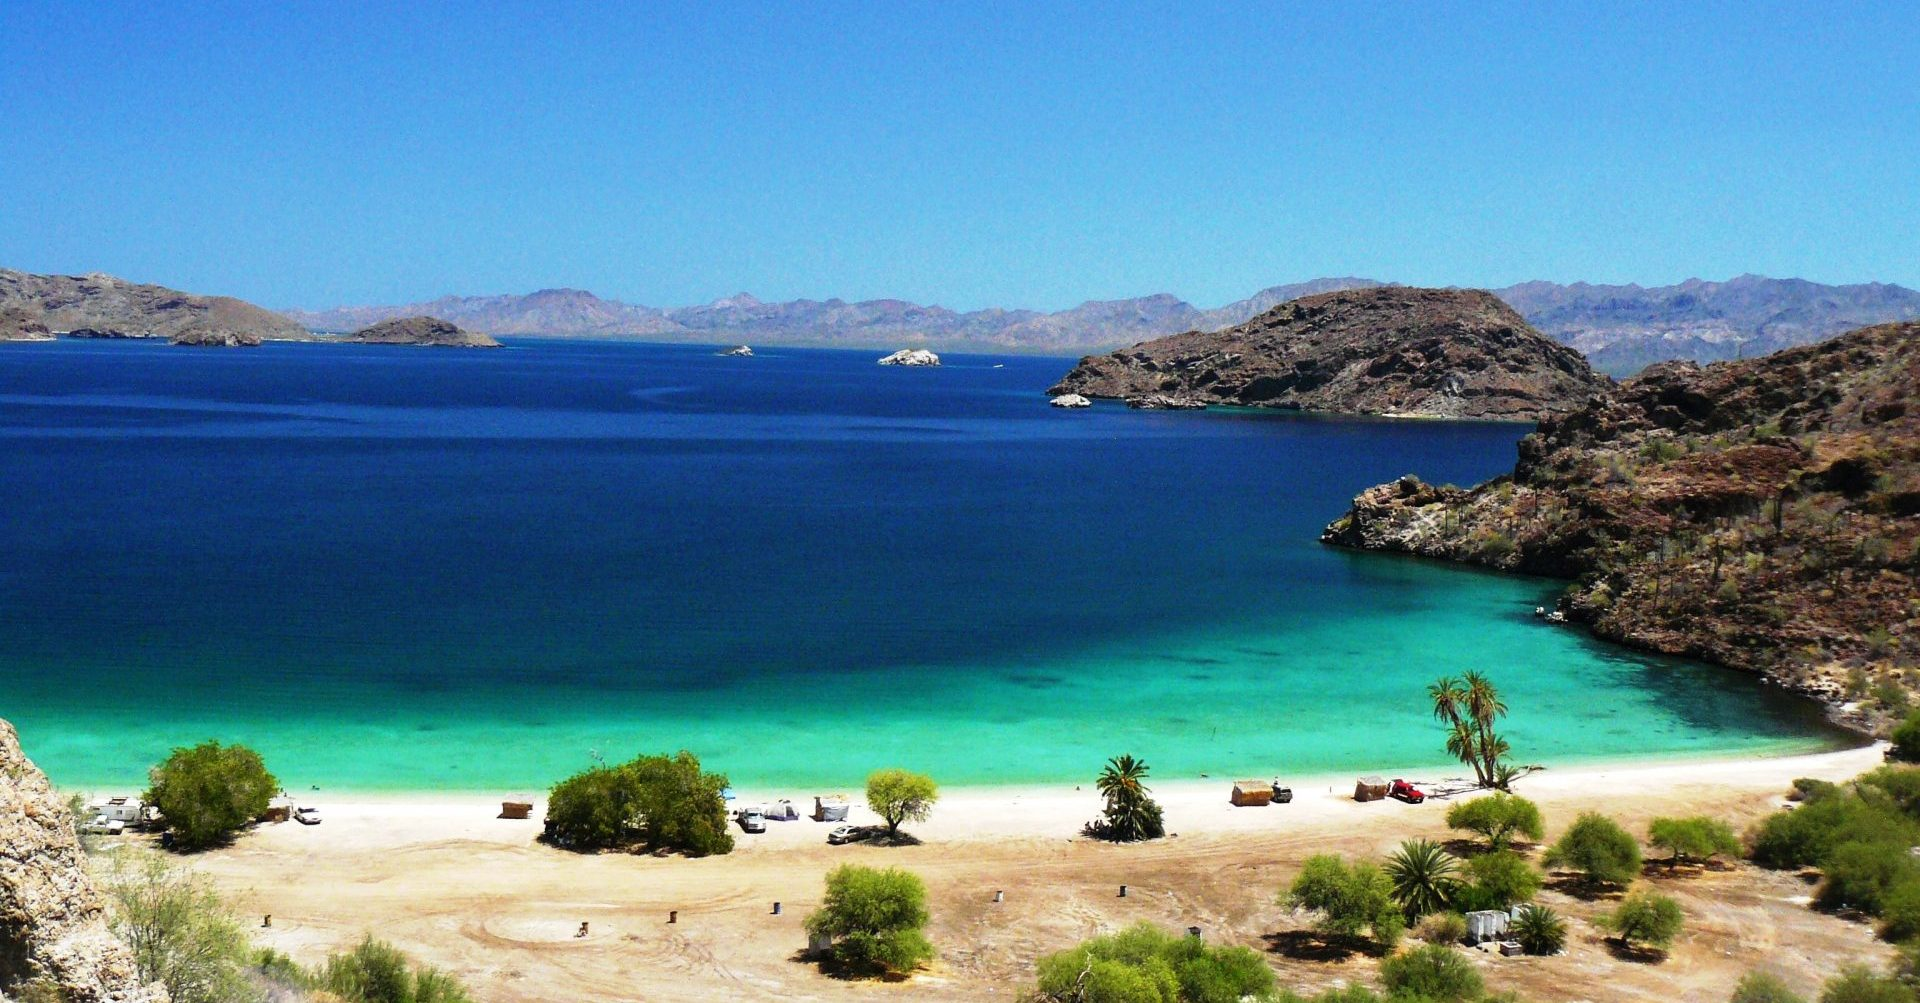 Mexiko_Baja California_Bucht_tuerkisblaues Meer_Reisen